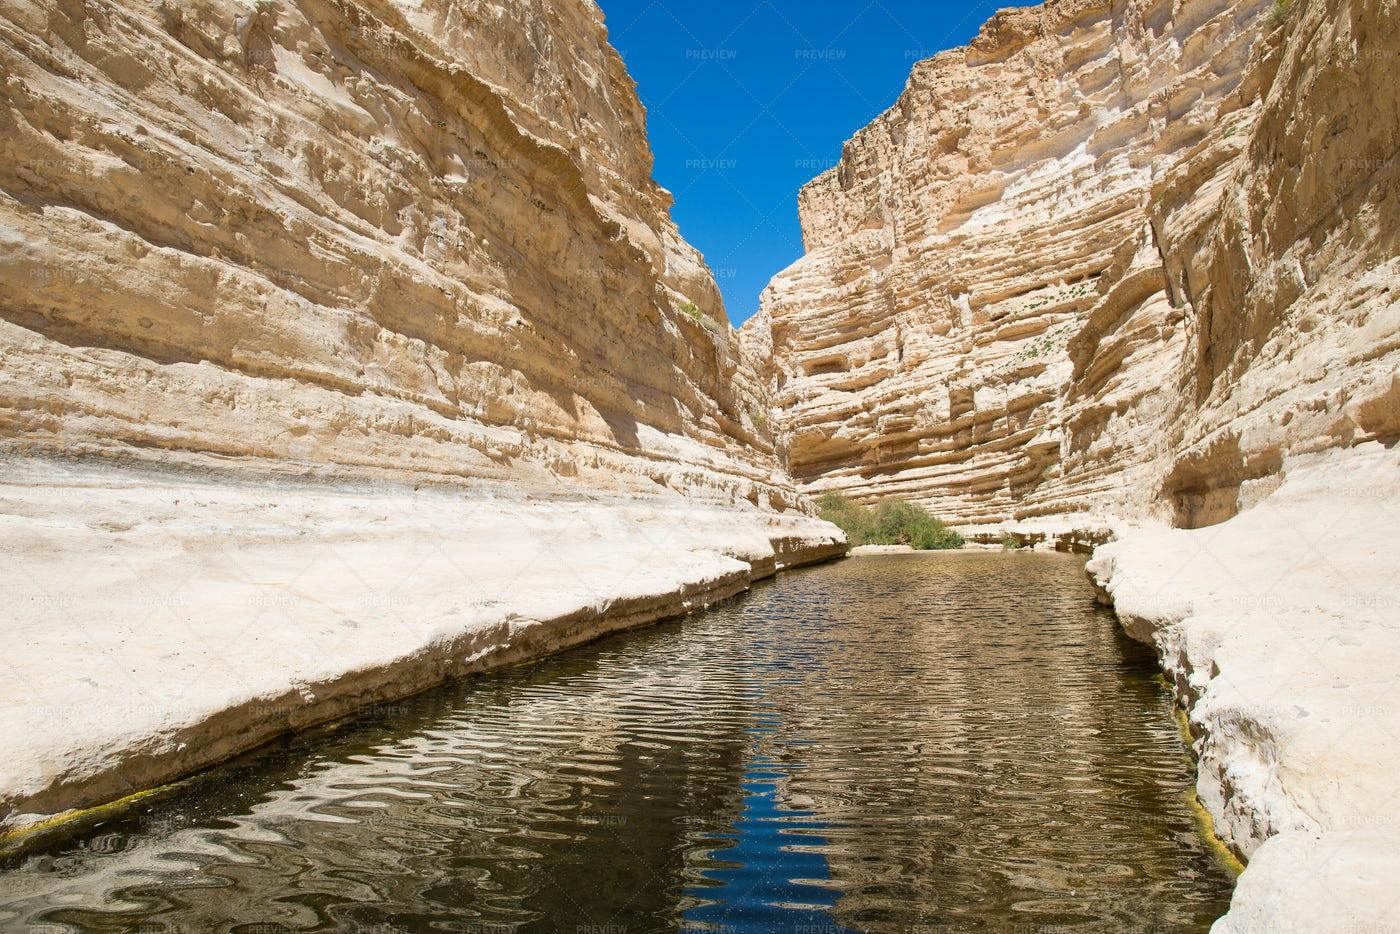 Canyon Ein-Avdat: Stock Photos